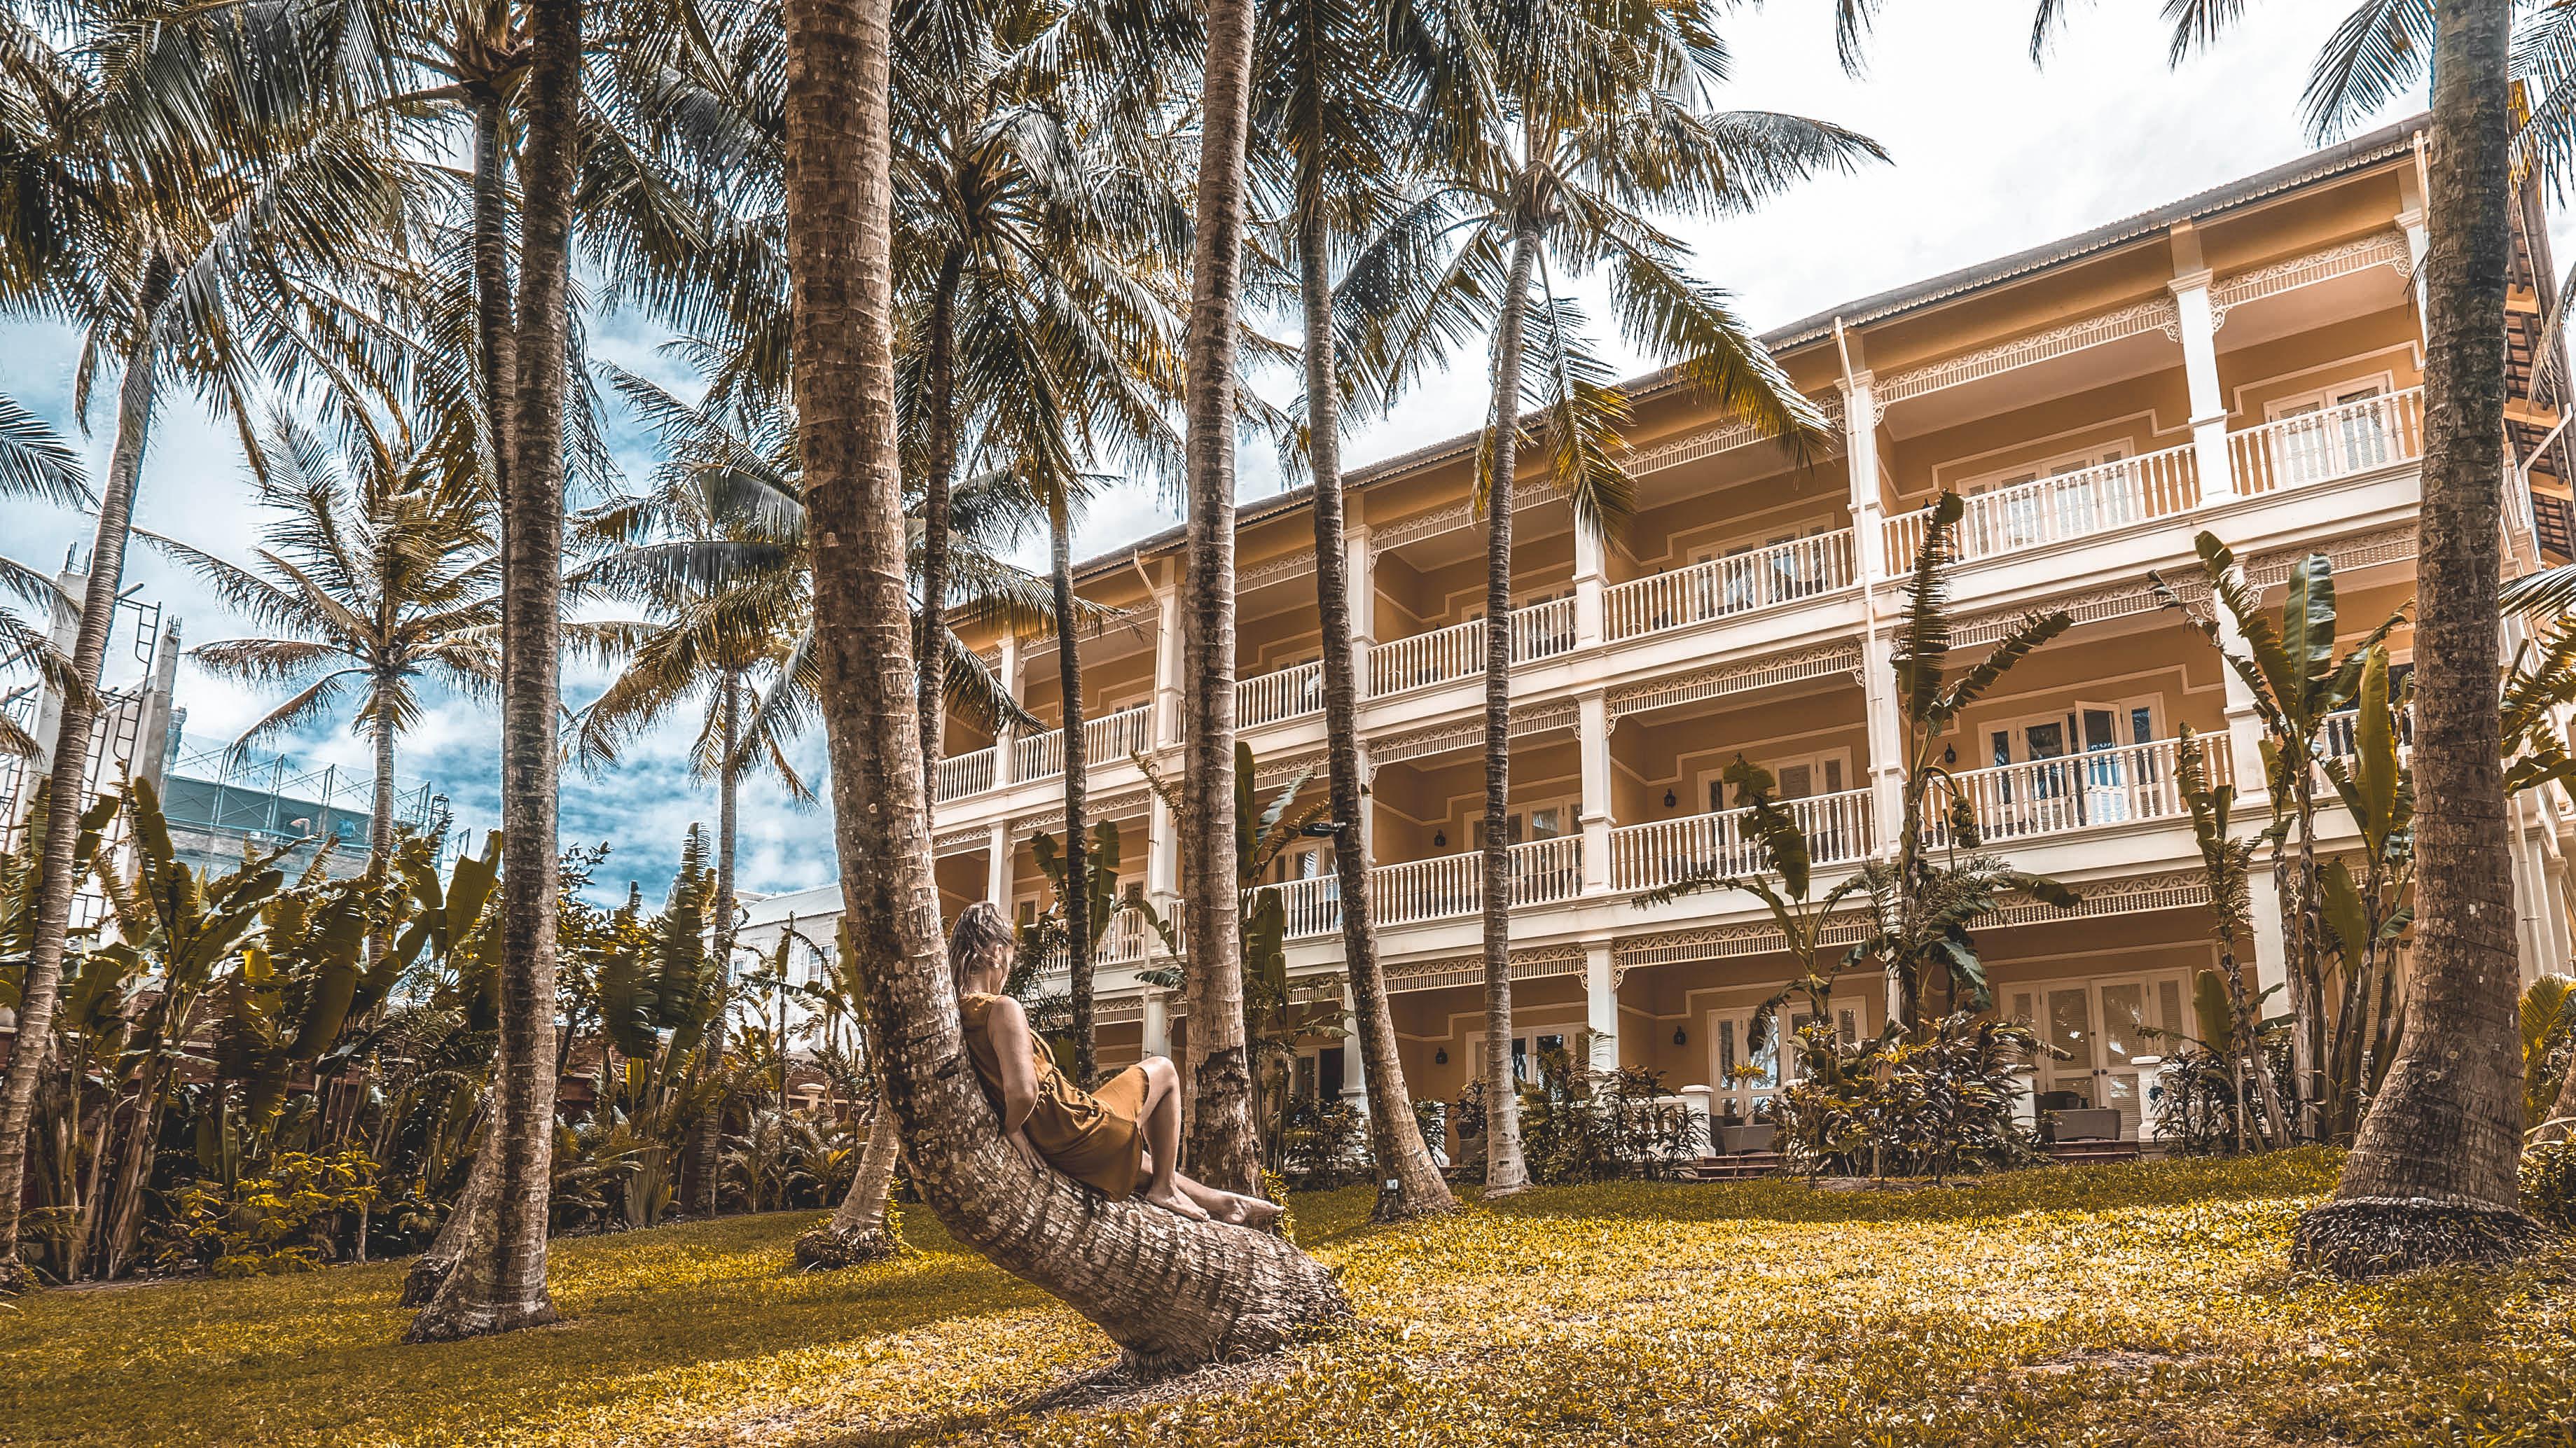 La Veranda Resort - Phu Quoc (Vietnam)